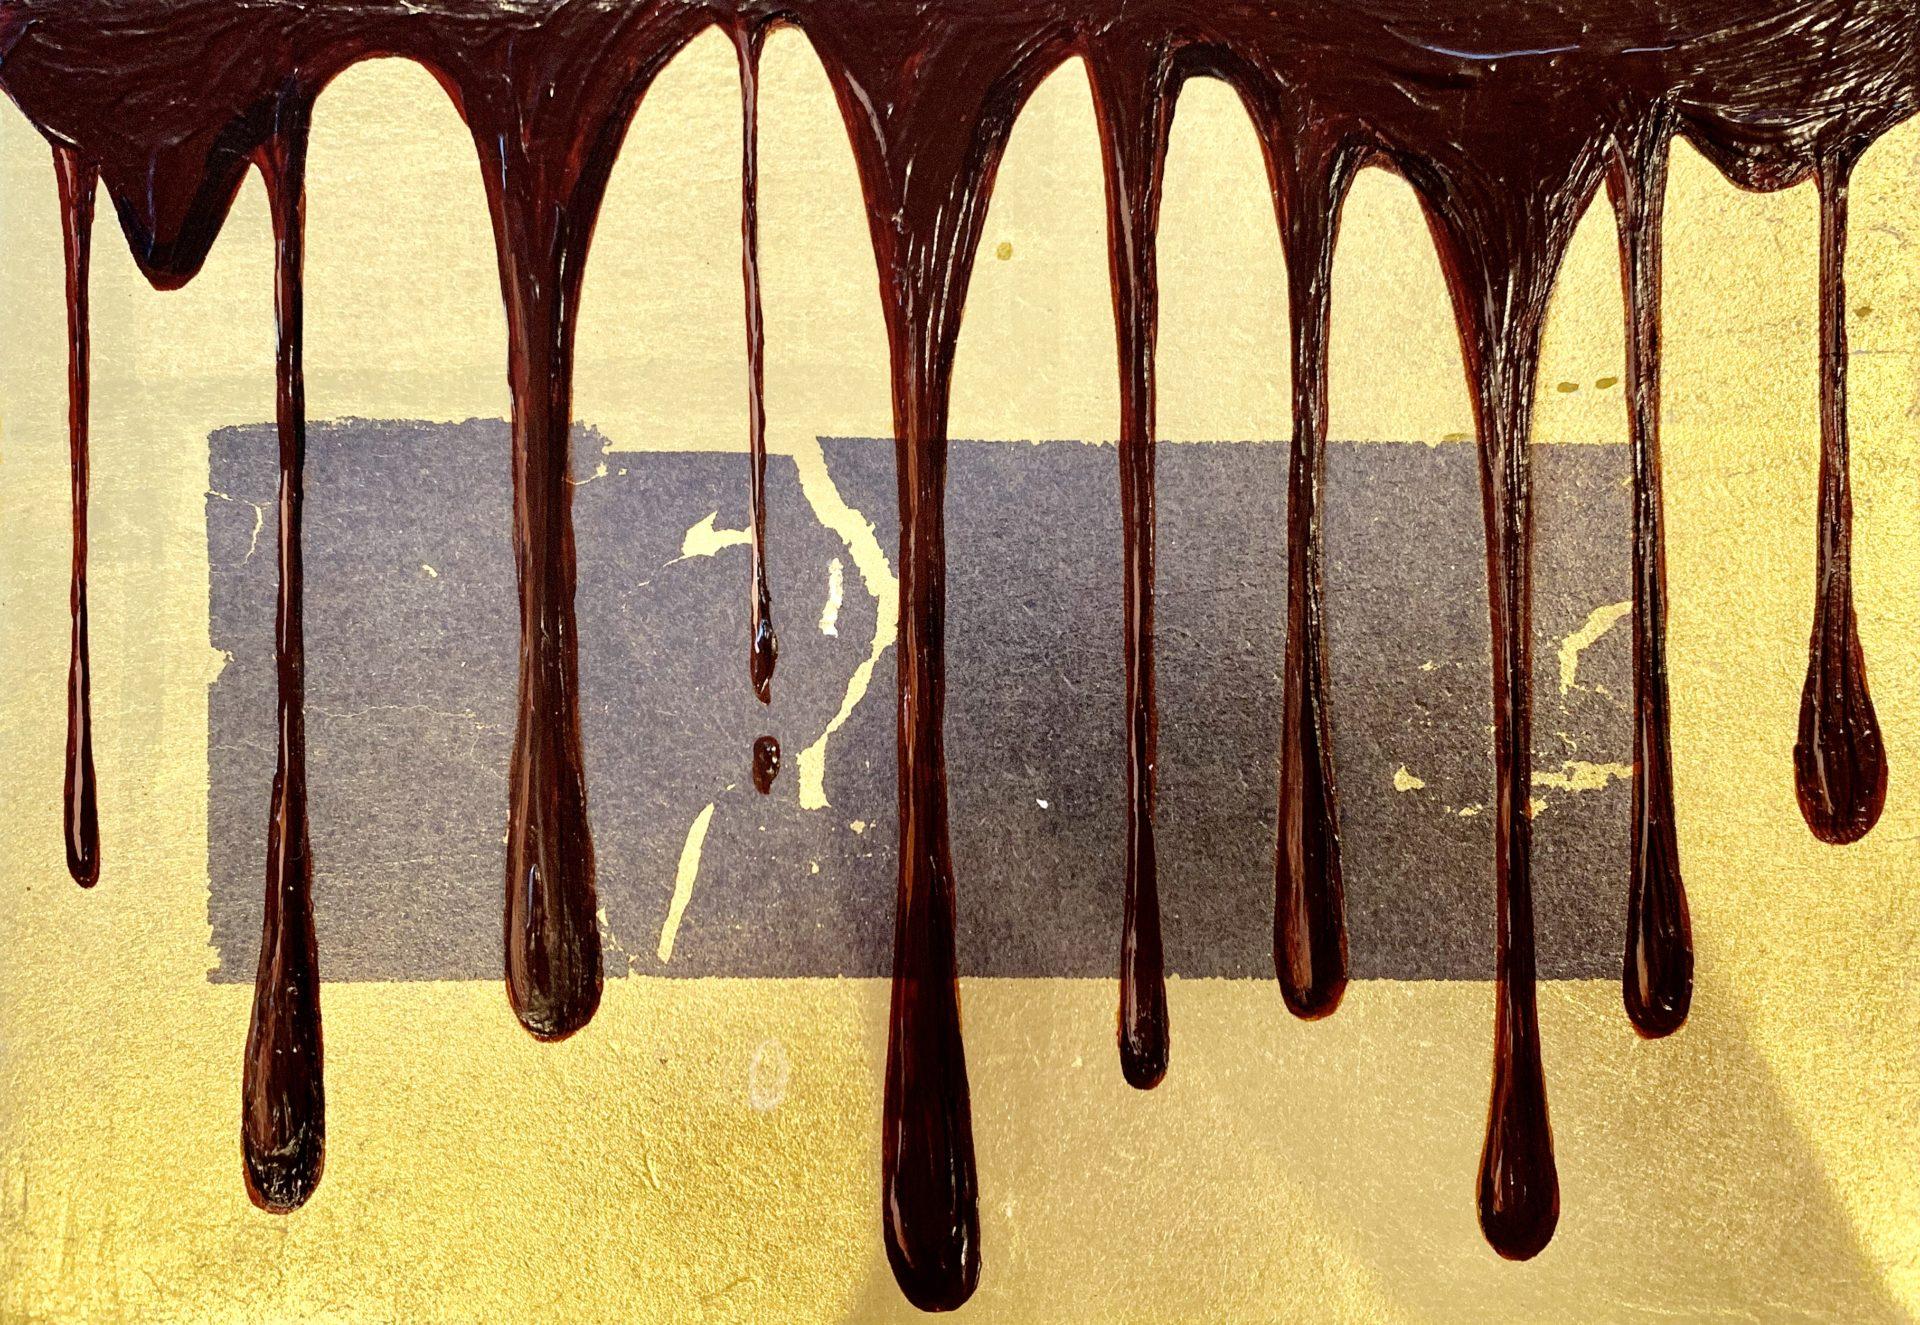 Chocolate -sweet temptation- vol.1